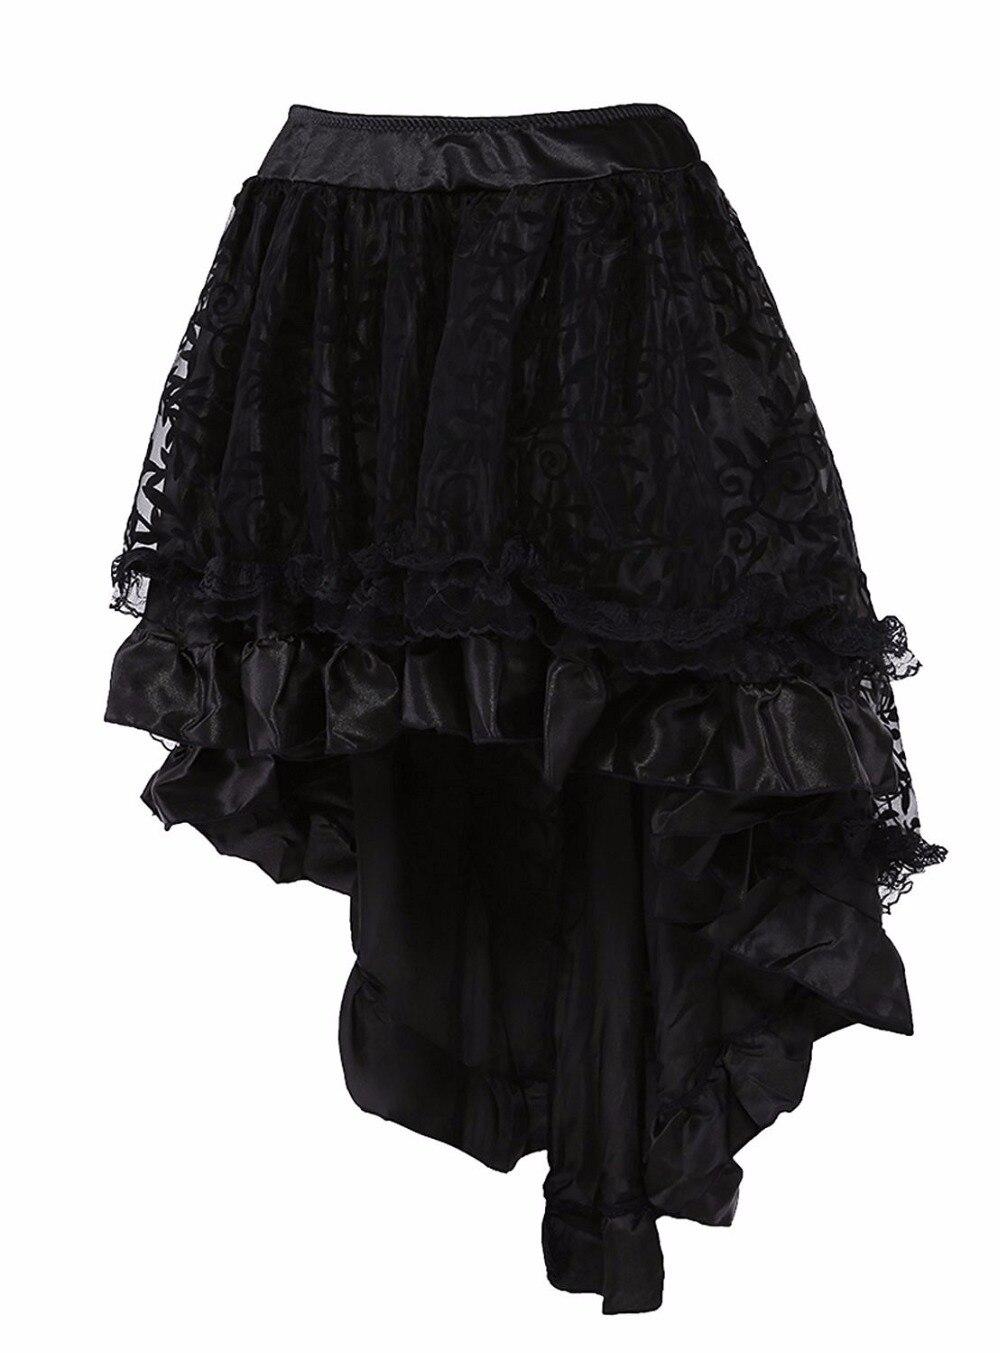 6XL Vintage Corset Dress Steampunk Dress Sexy Gothic Dresses Burlesque Skirt For Women